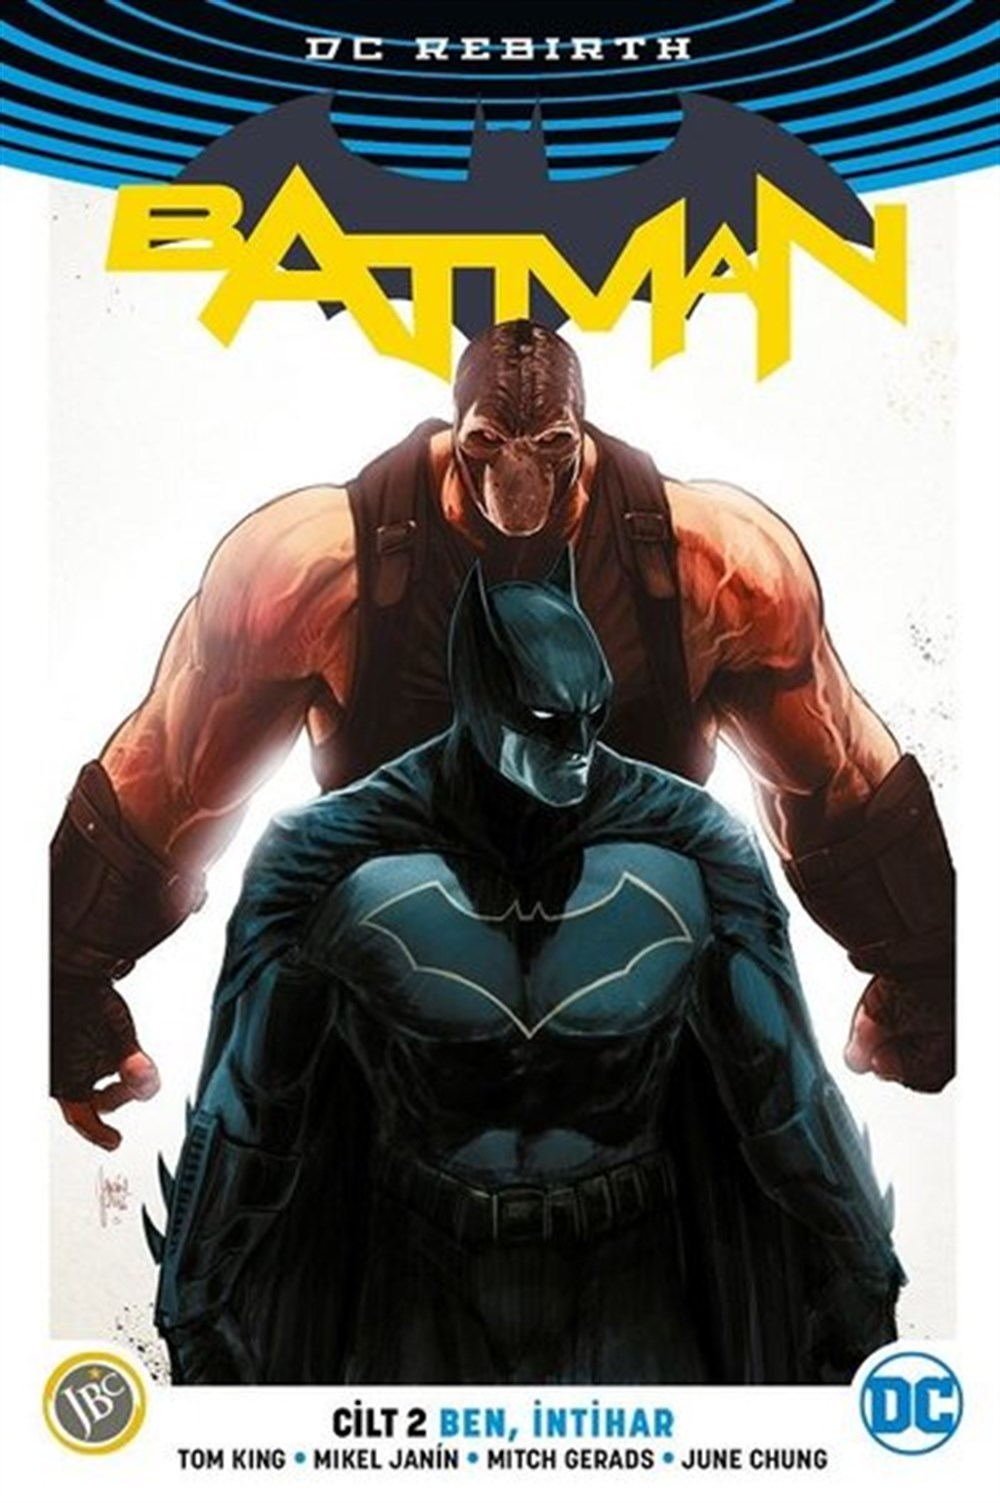 Batman Rebirth Cilt 2: Ben, İntihar